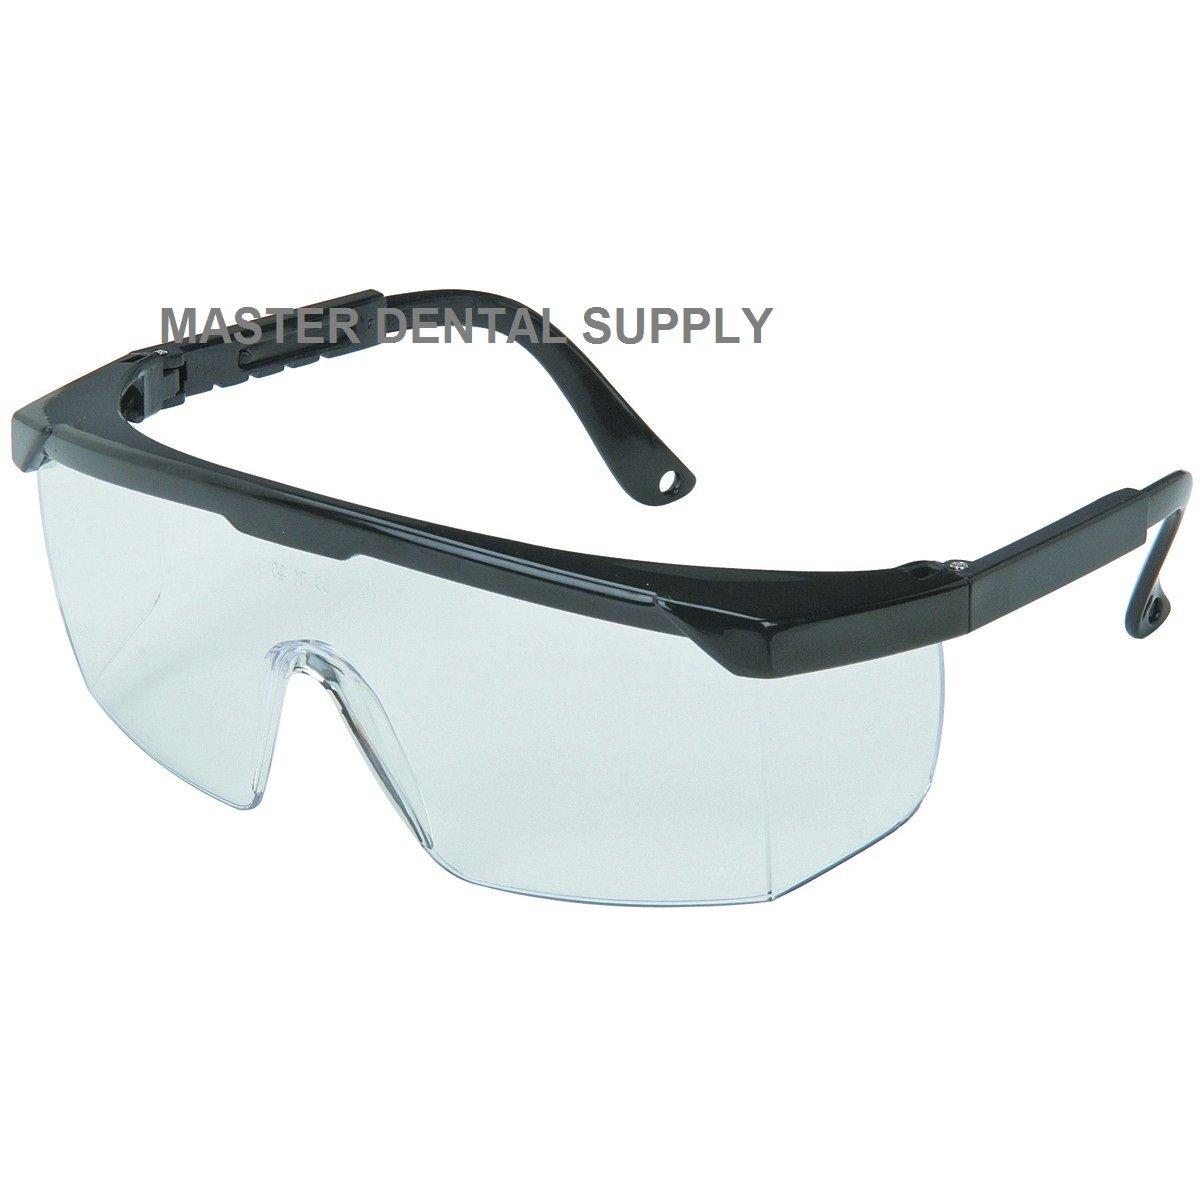 Protective Eyewear Goggle CLEAR Black Frame Dental Safety Glasses